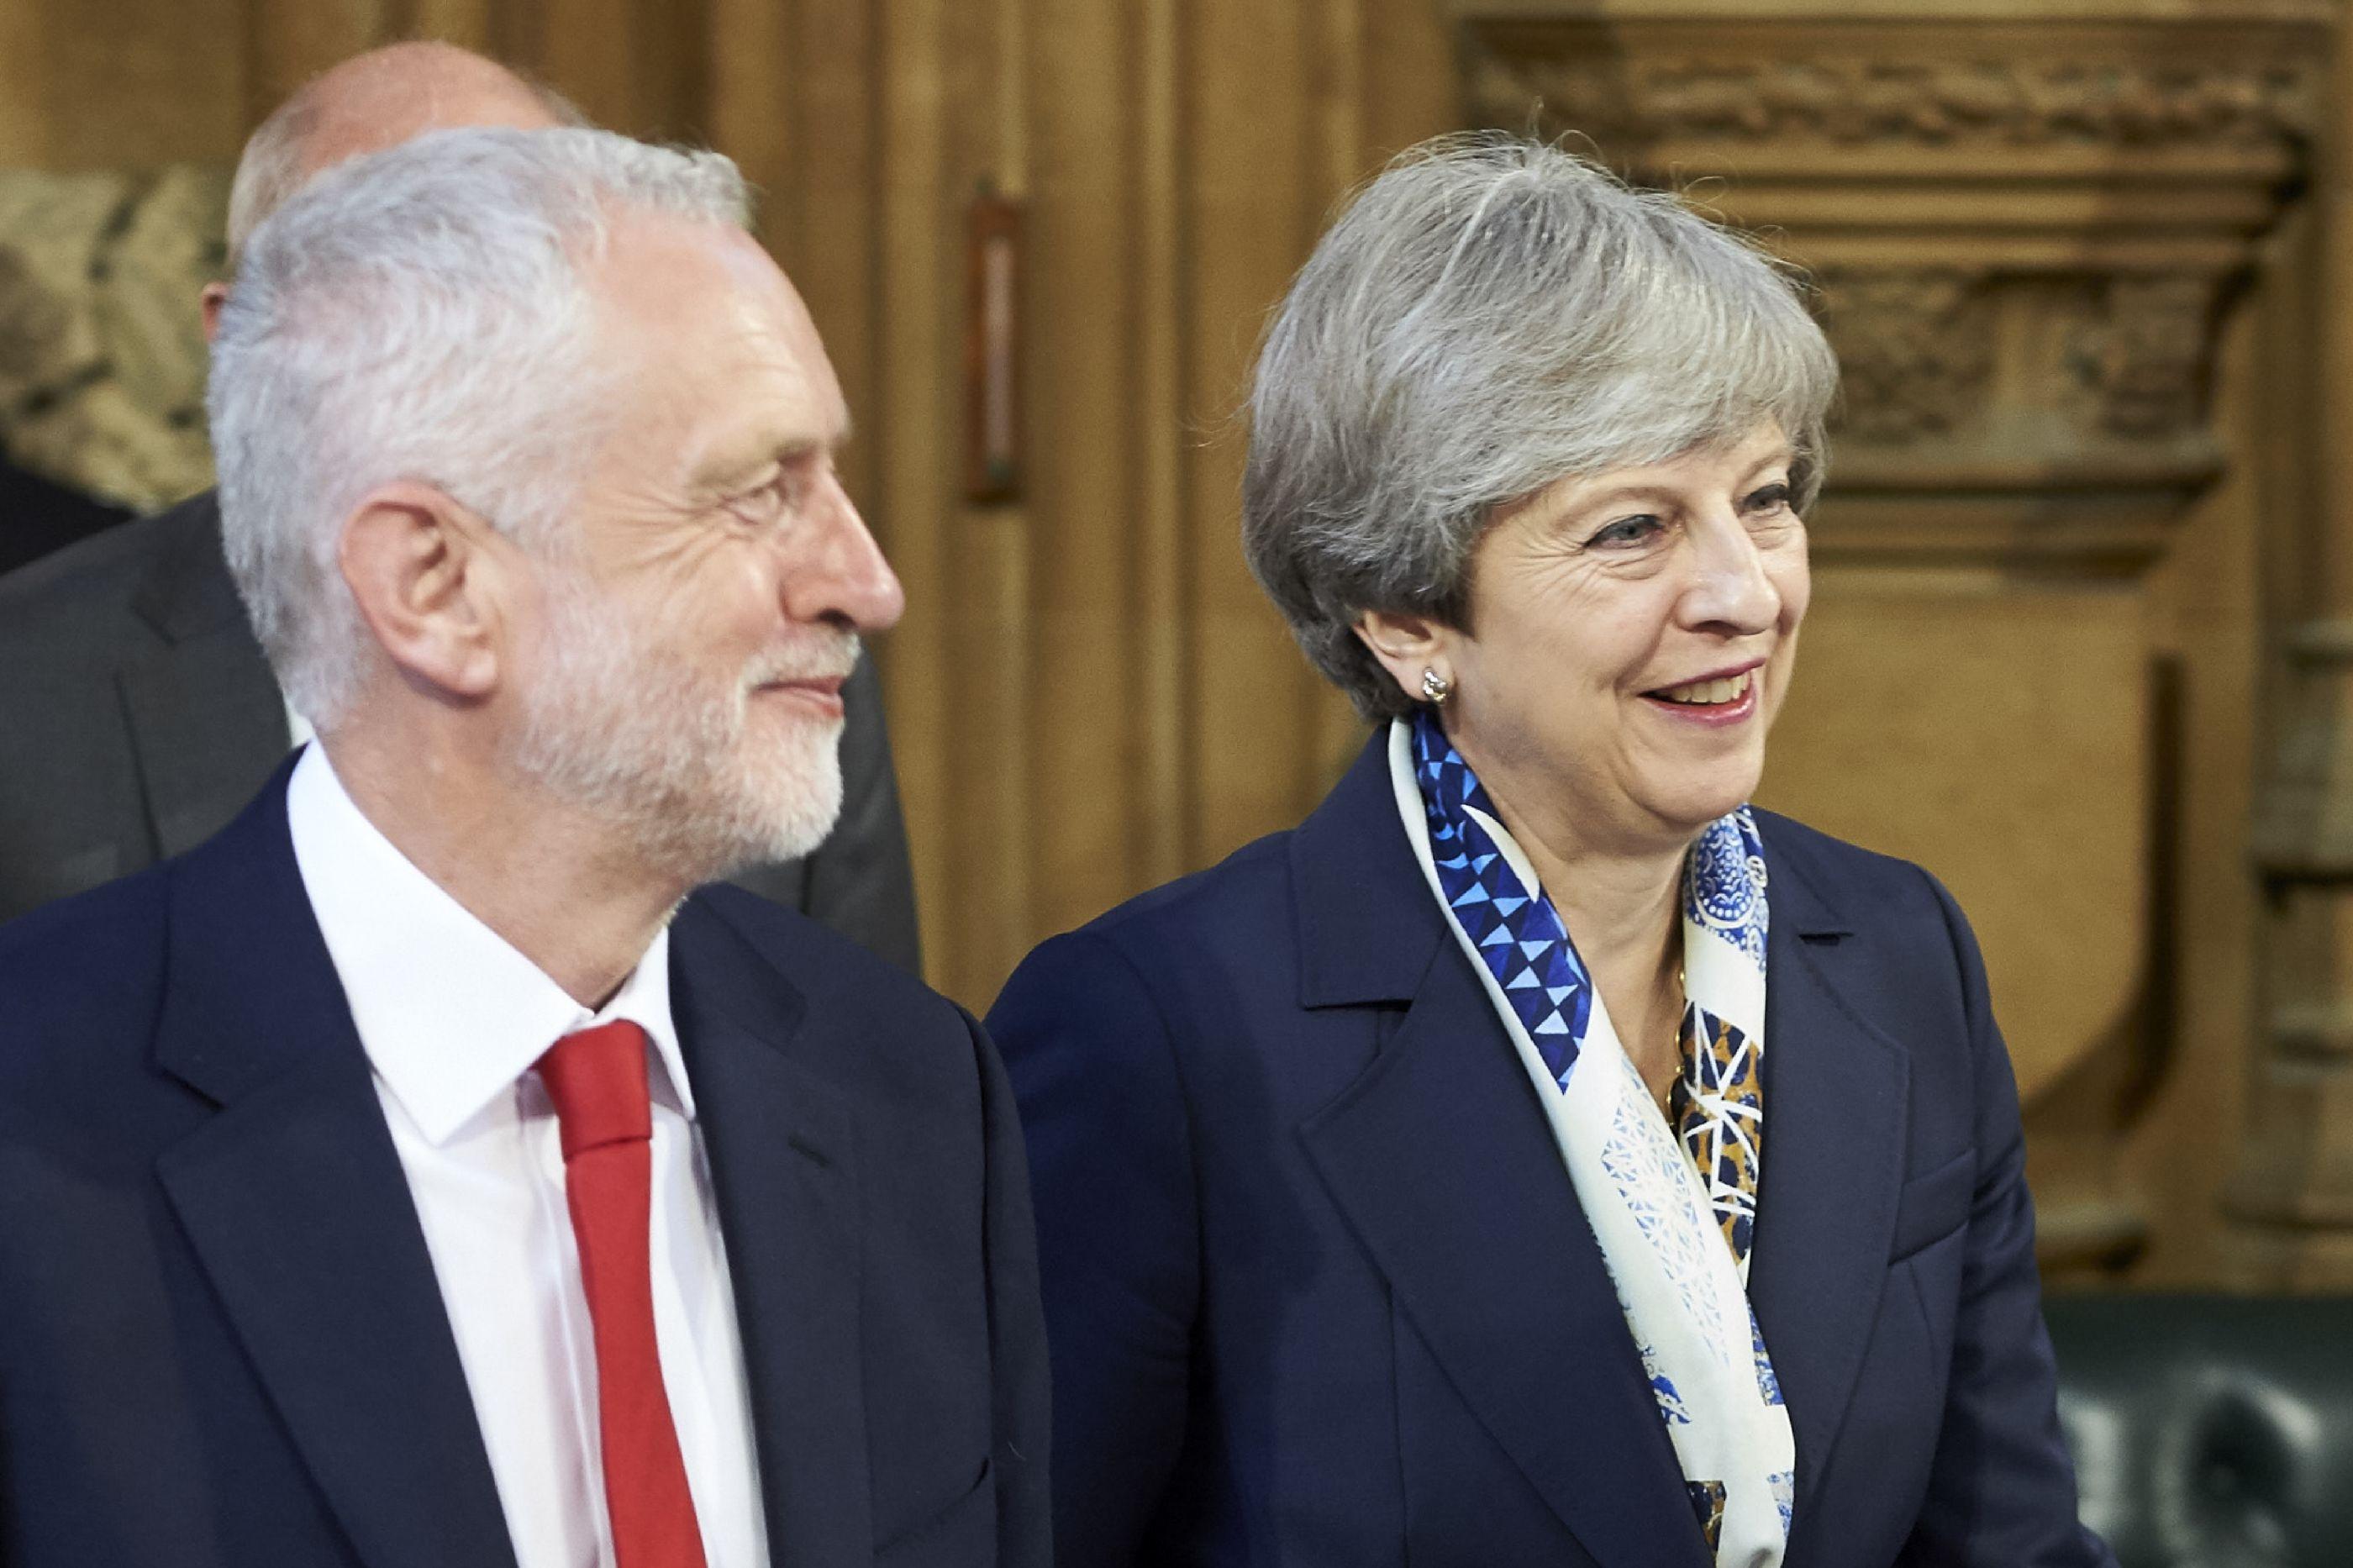 Jeremy Corbyn vai avançar com moção de censura a Theresa May